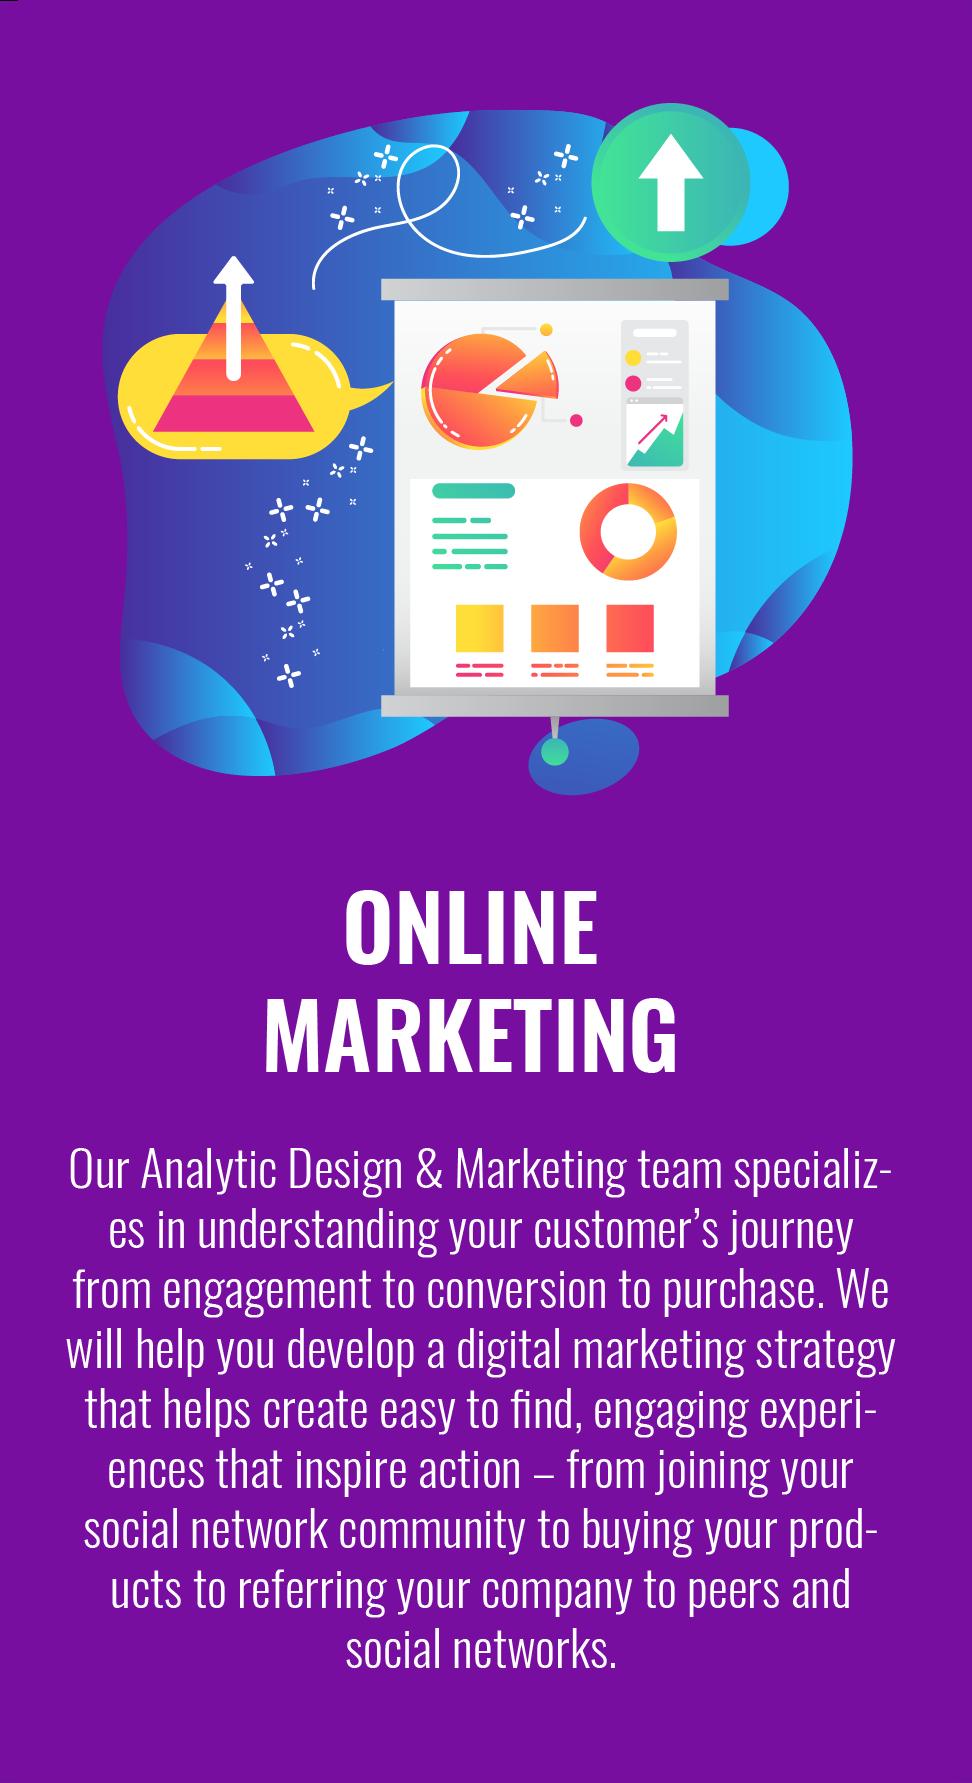 Online Marketing Services in Rockville Bethesda Frederick Baltimore Maryland